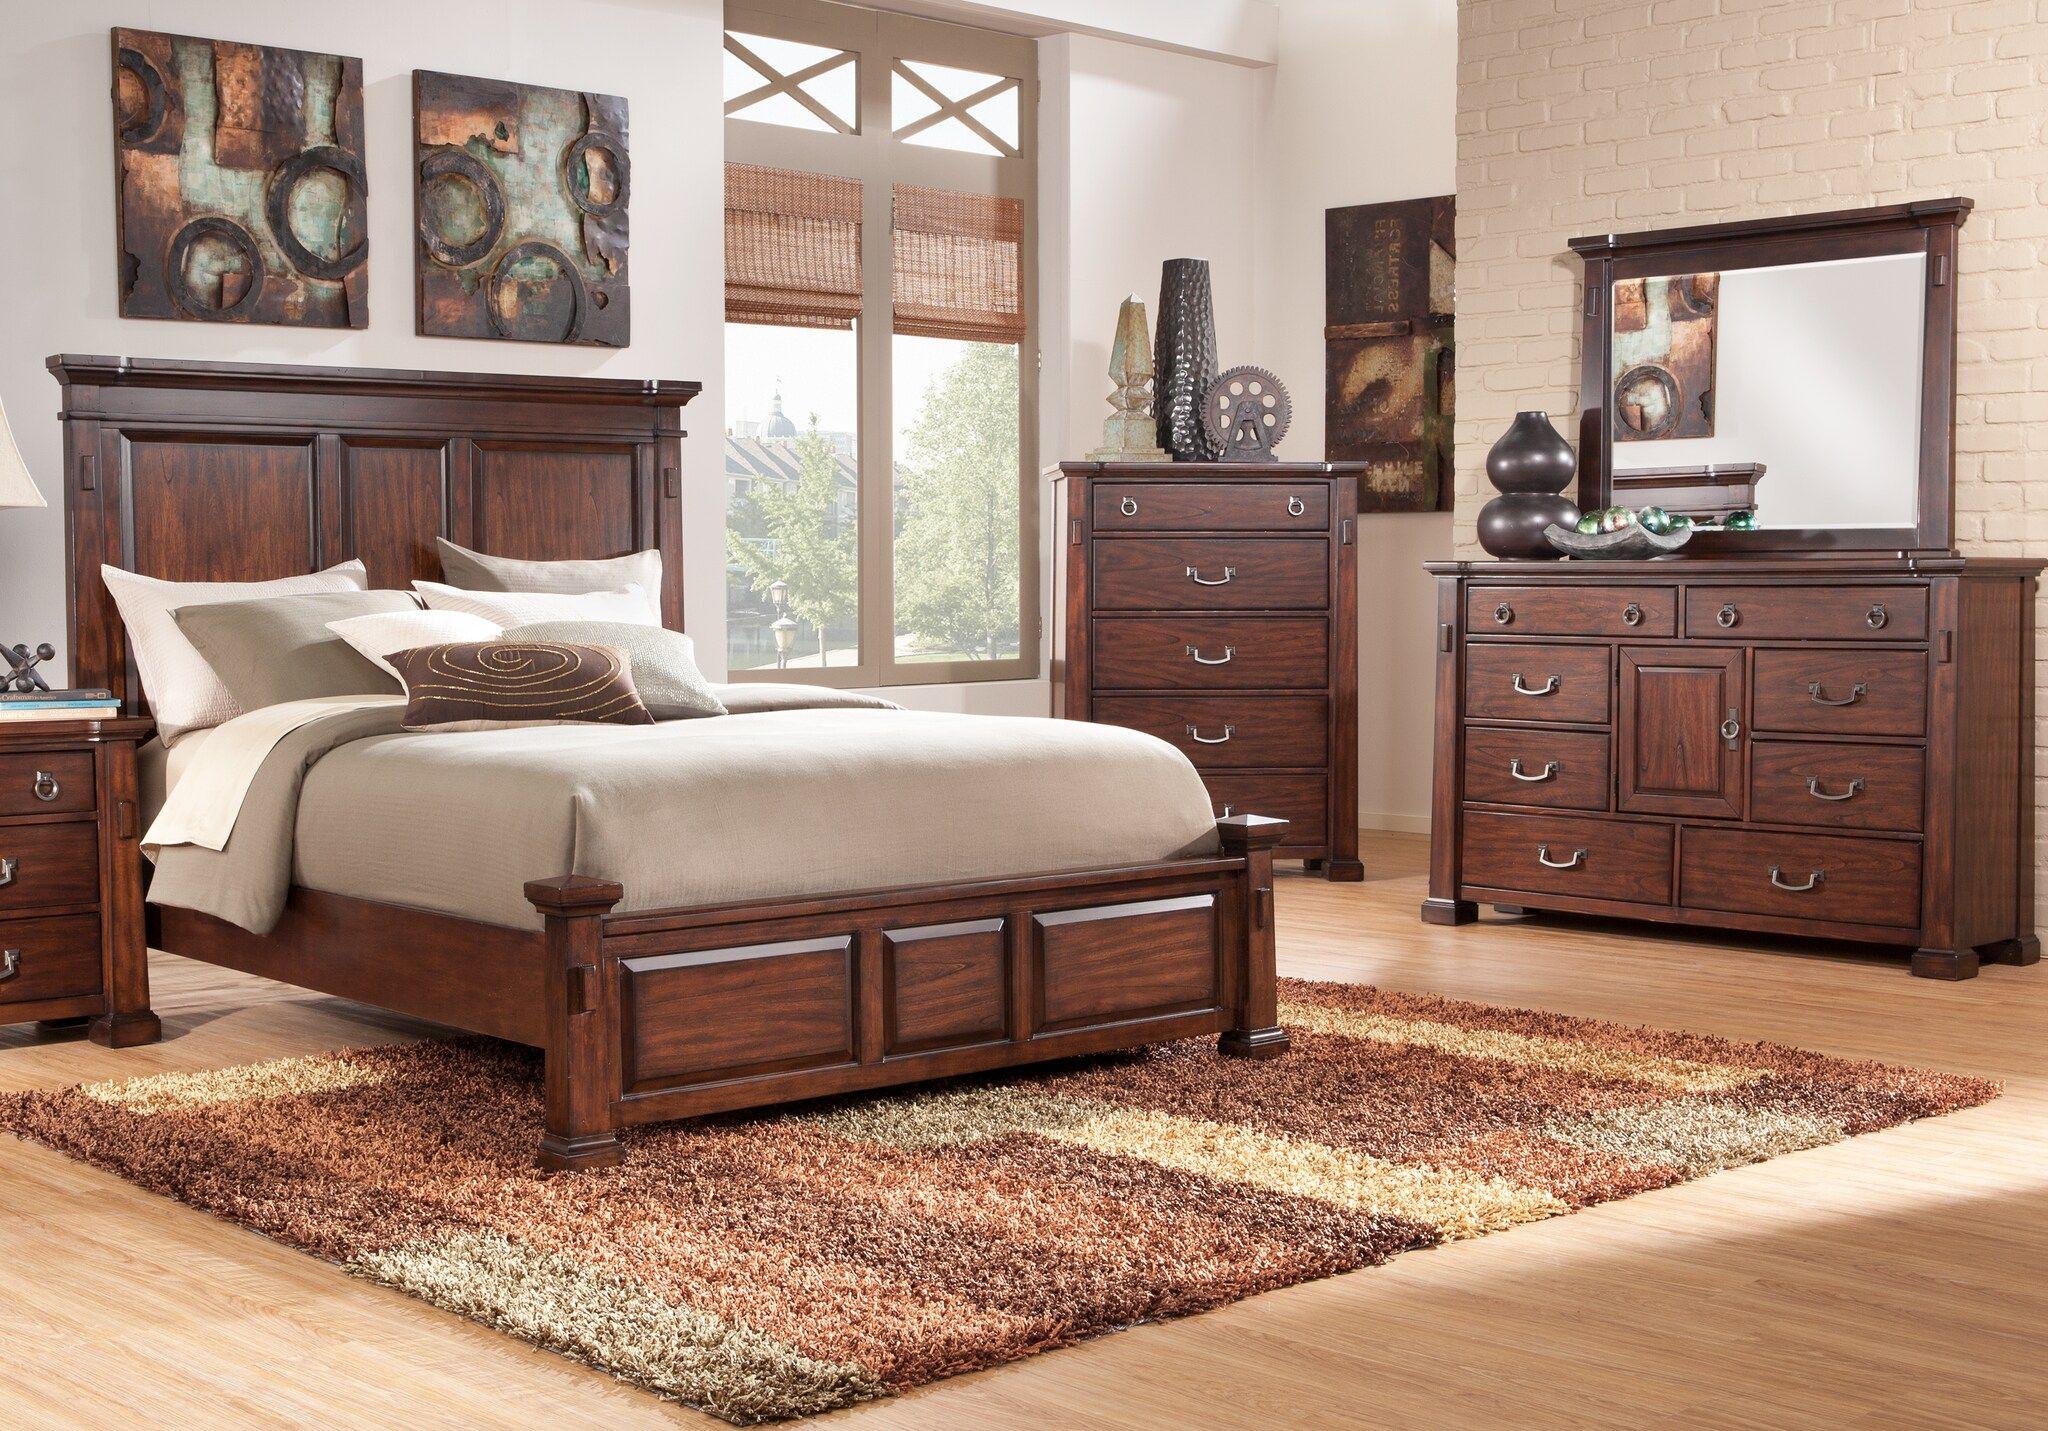 affordable queen bedroom sets for sale 5  6piece suites